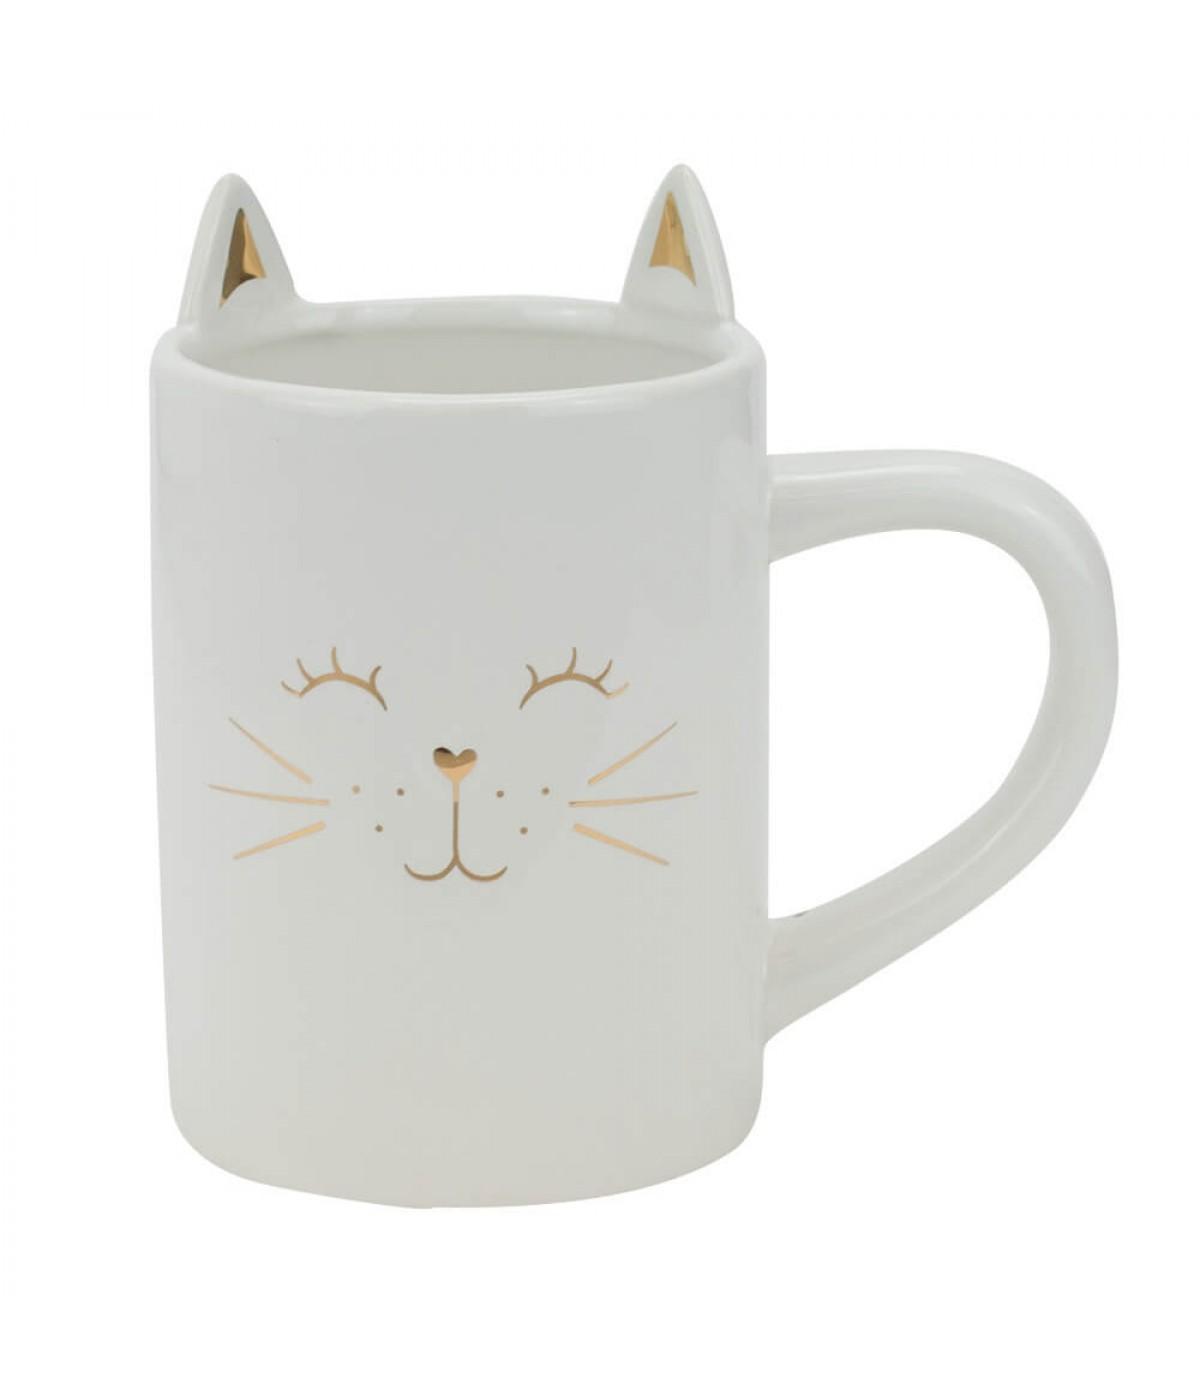 Vaso Caneca Cerâmica Branco Gato 13cm